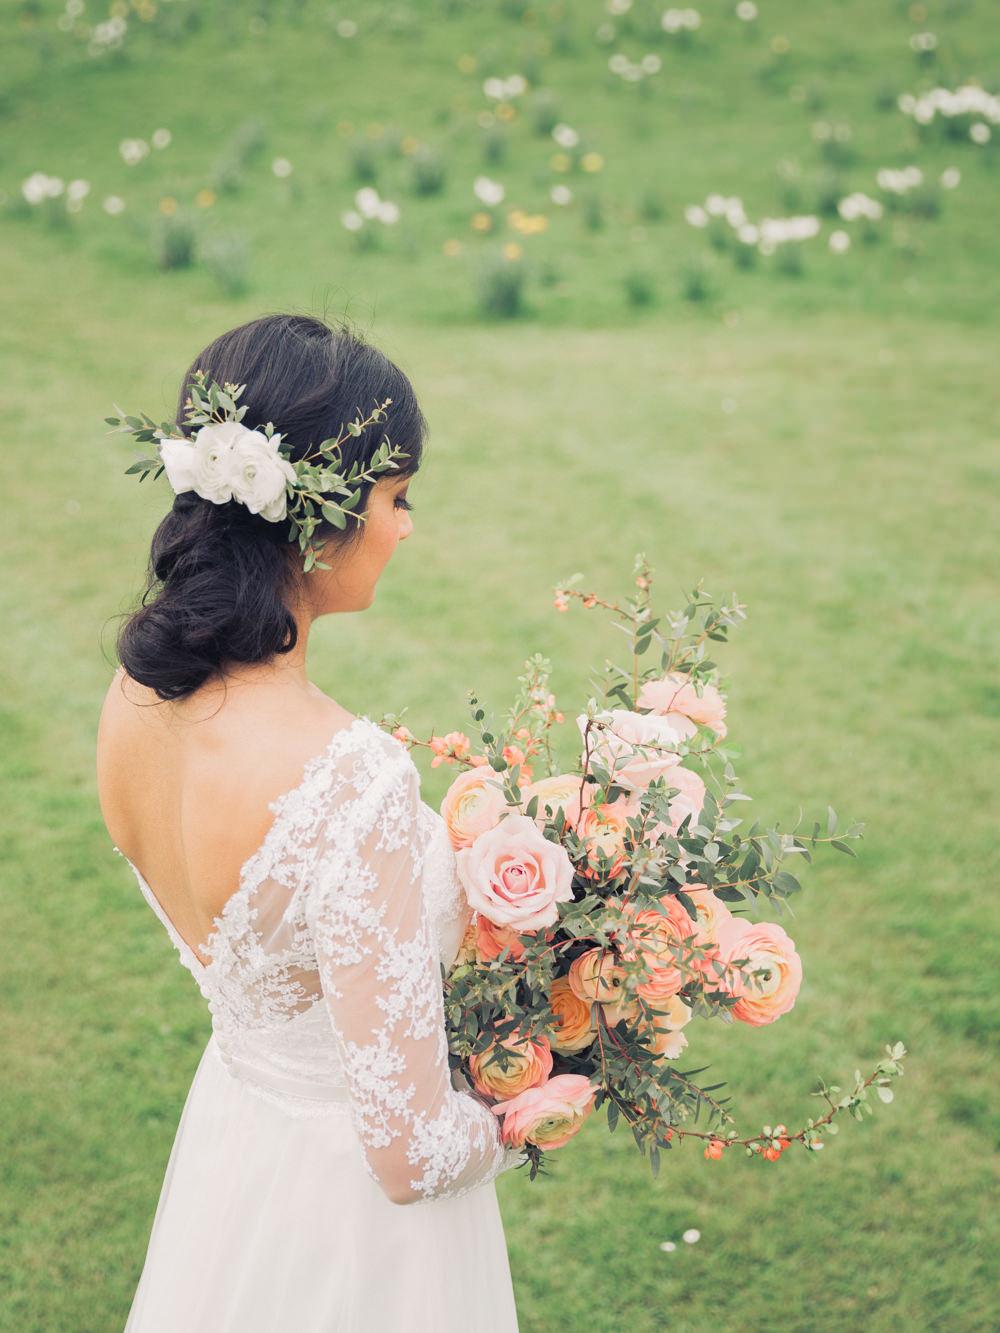 - Make Me Bridal Artist: Love your hair Cassandra . #bridalhair #updo #elegant #lowupdo #romantichairup #bridesmaidhair #weddinghair #bridesmaid #indianbride